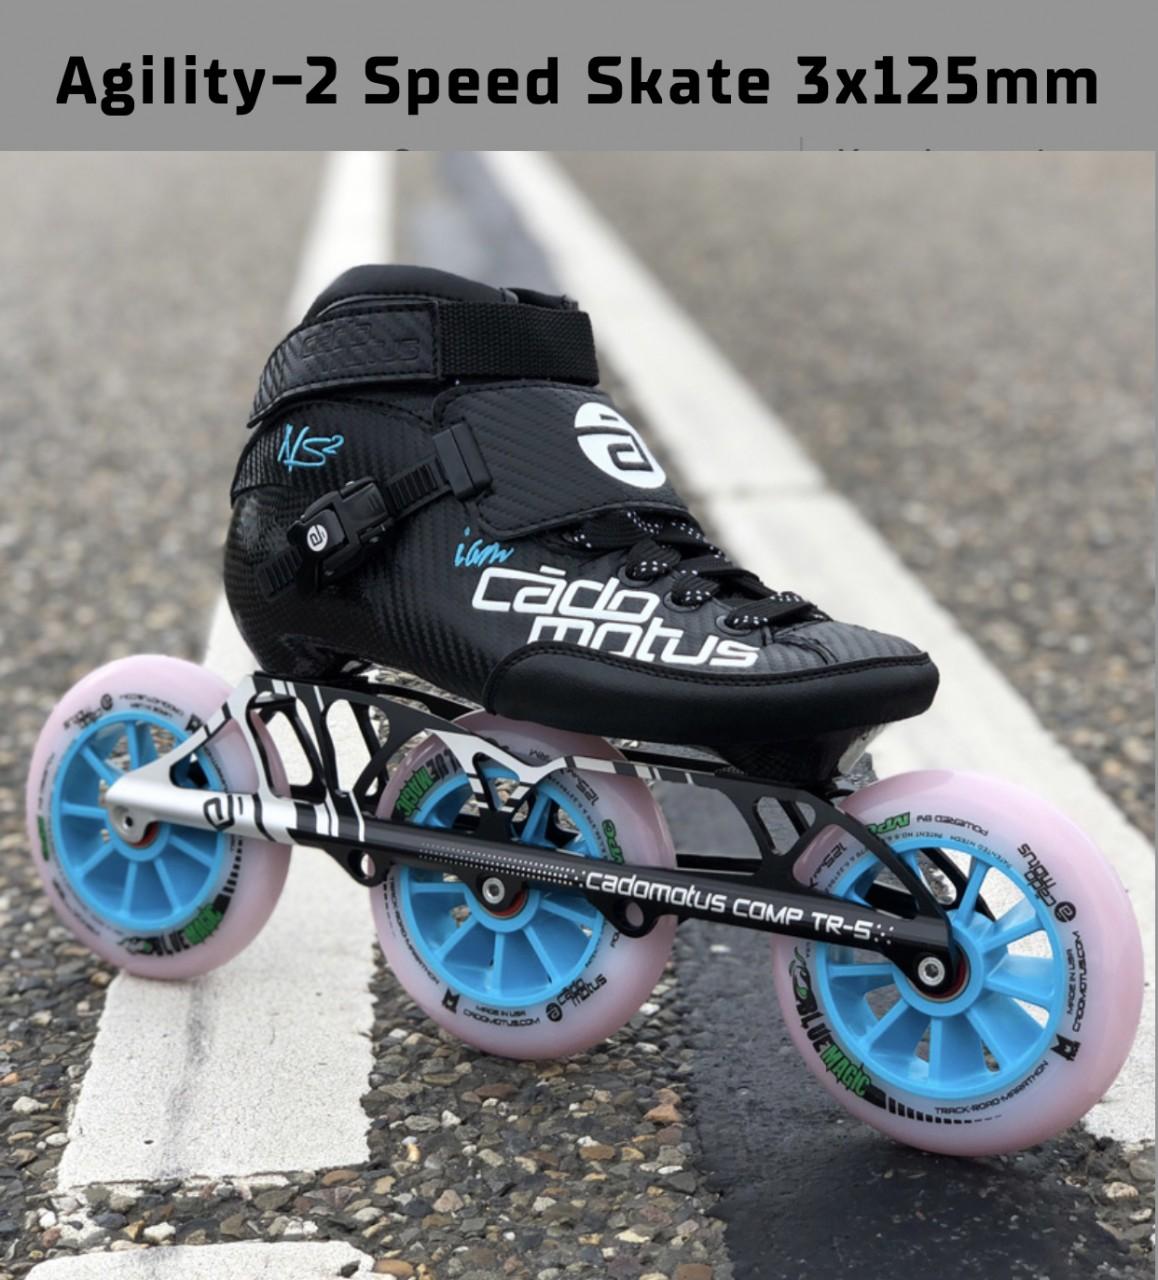 Komplettset Agility-2 Speed Skate 3x110mm